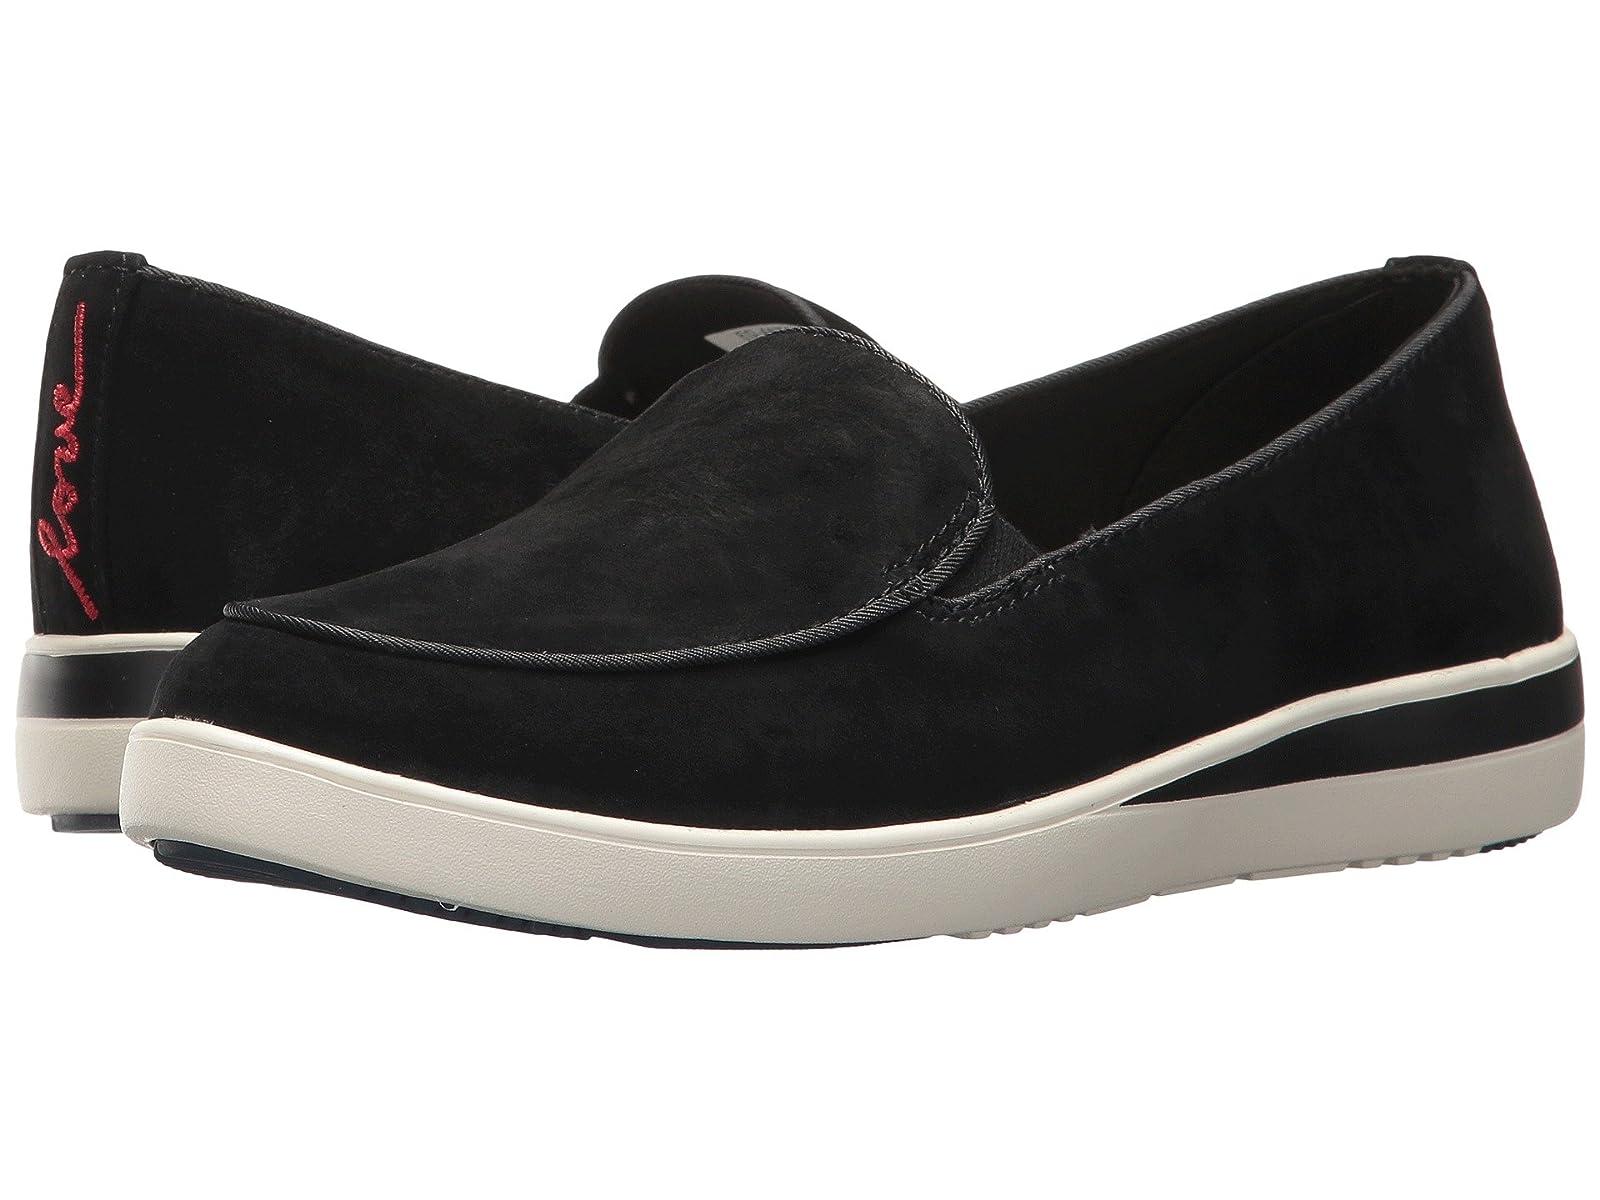 ED Ellen DeGeneres AntonaCheap and distinctive eye-catching shoes